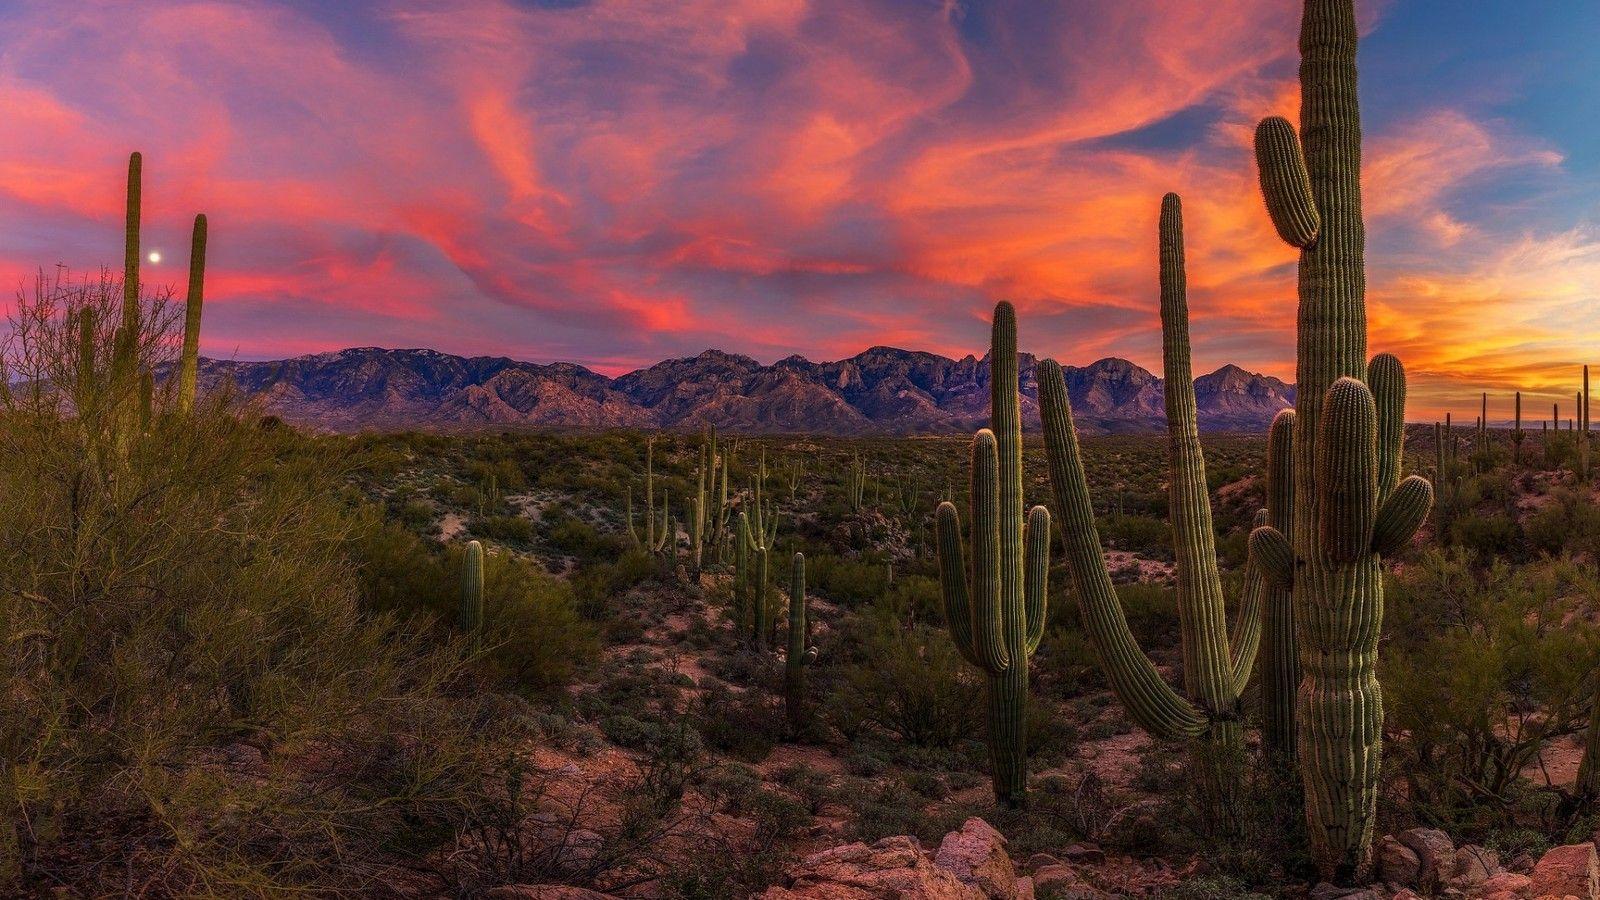 Cactus In The Desert Desert Photography Cool Landscapes Sunset Wallpaper Hd wallpaper cacti evening sunset desert